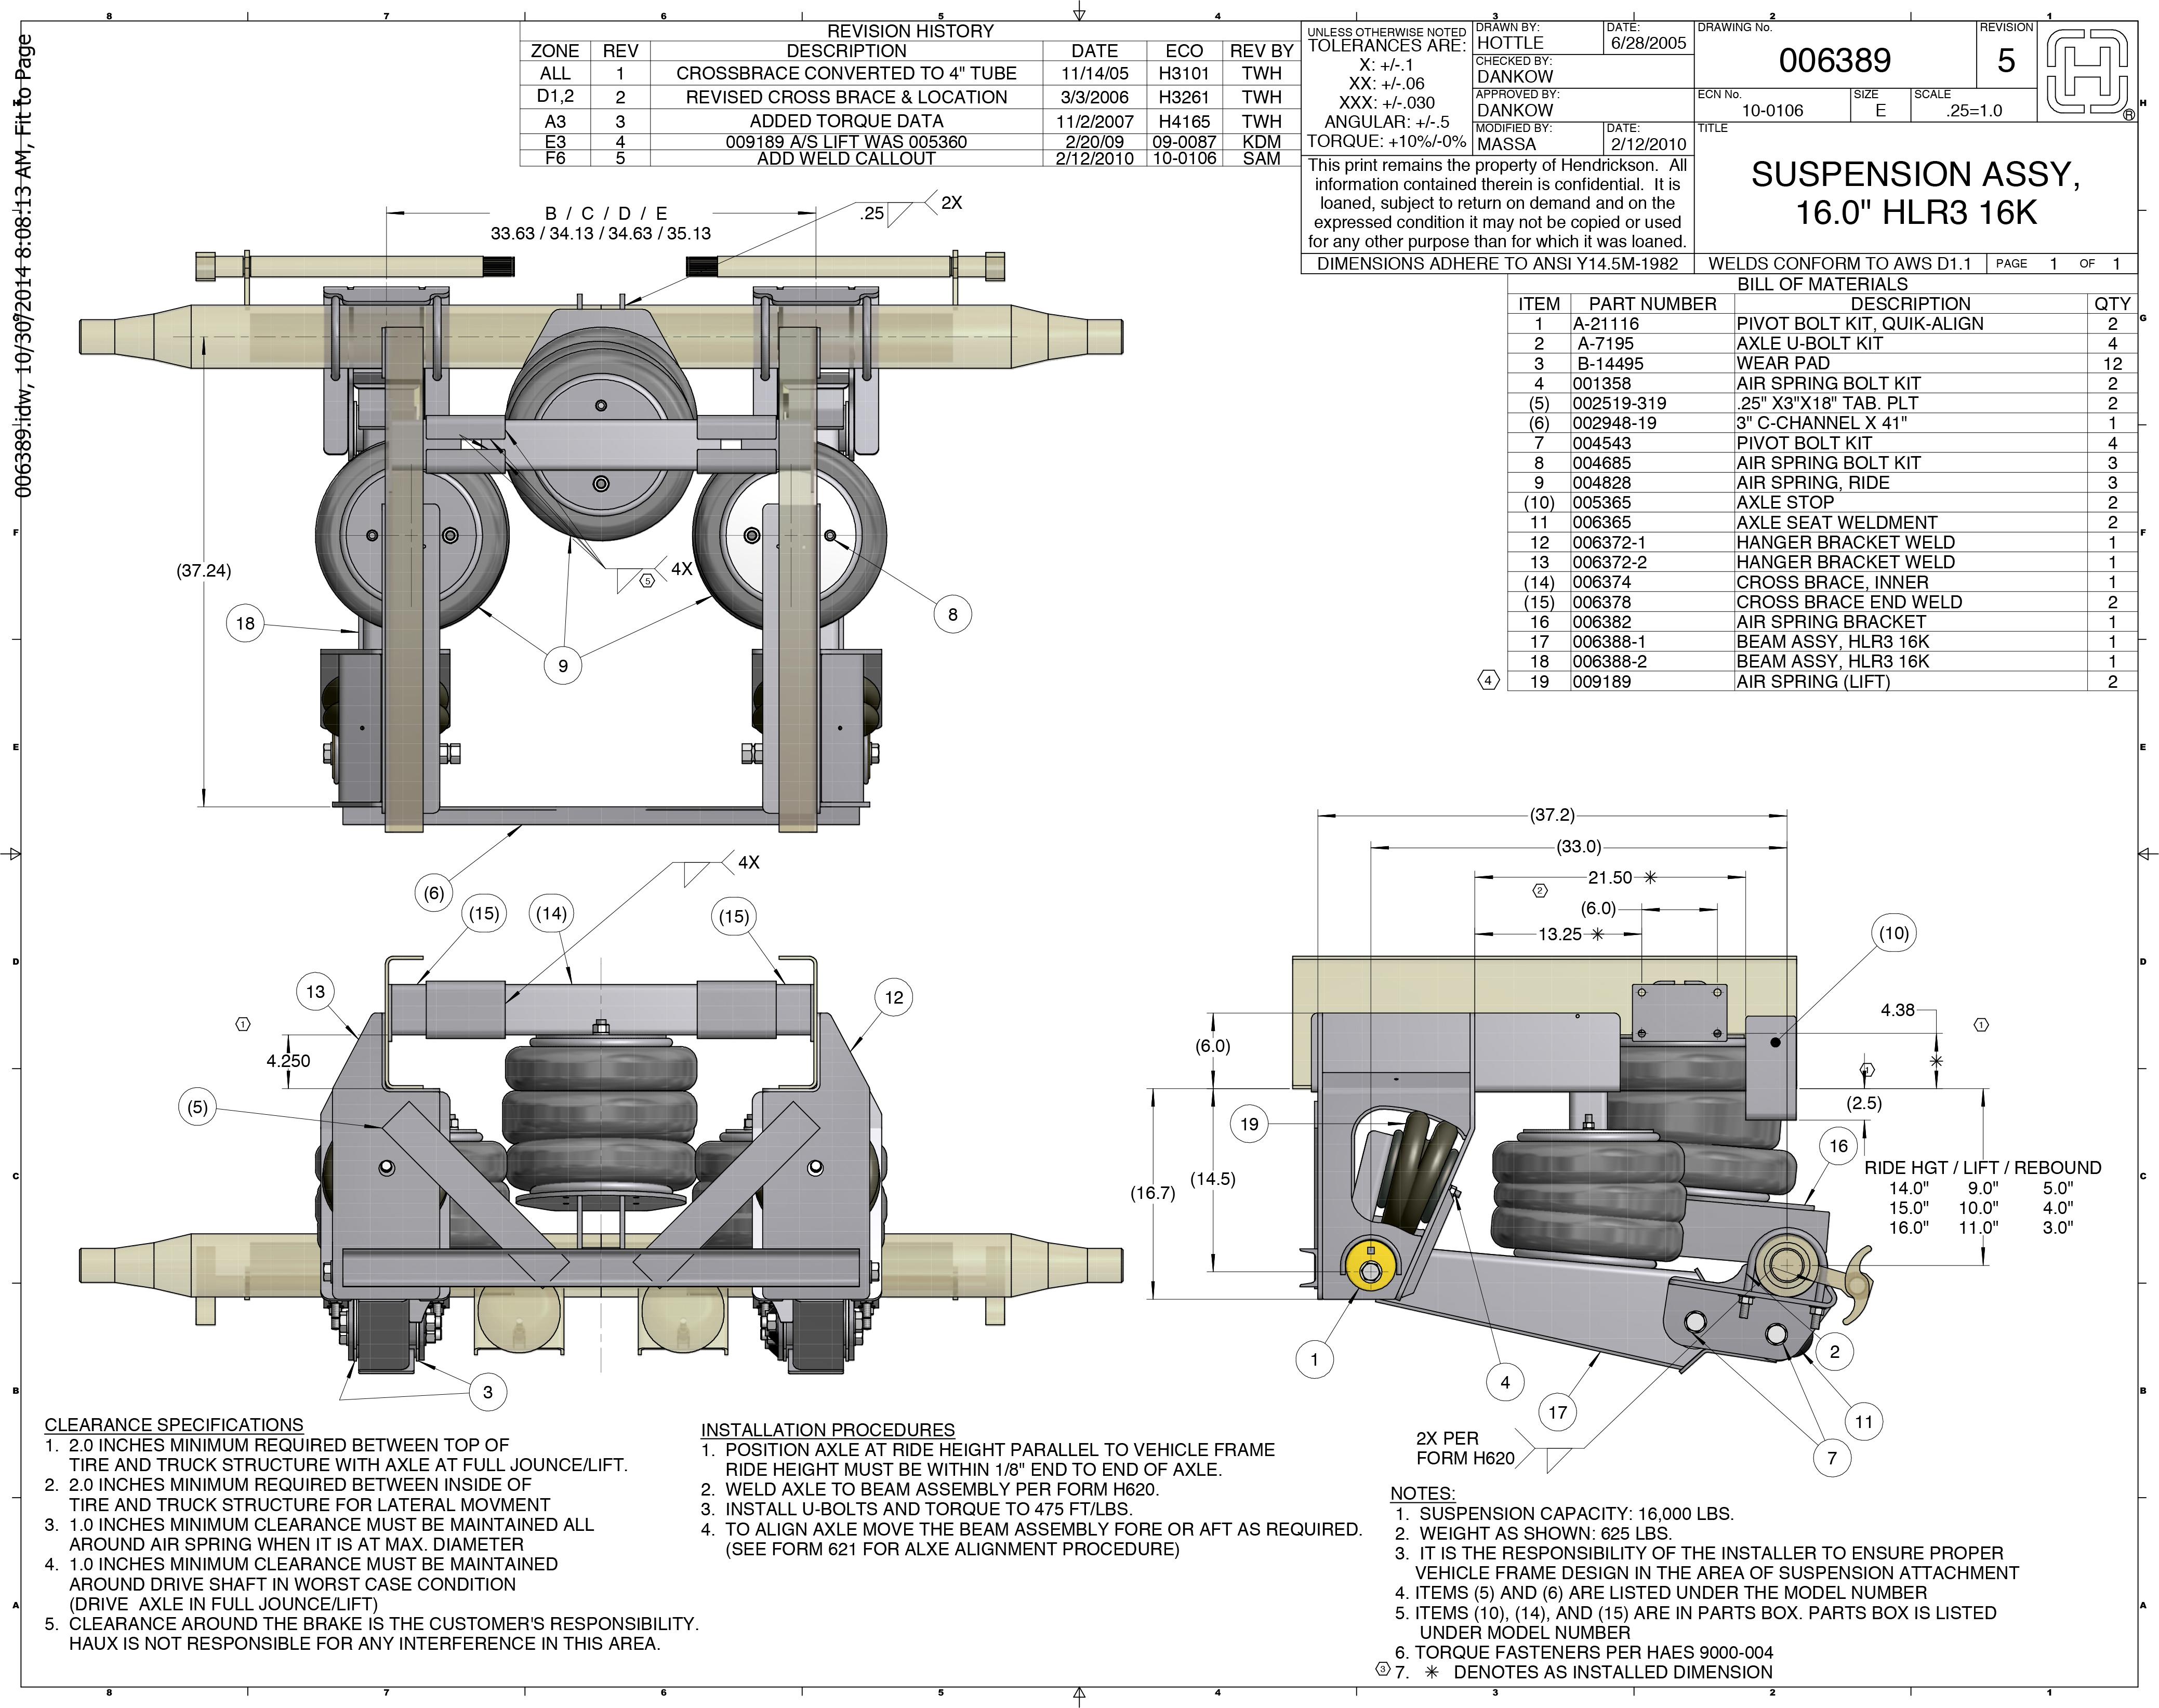 Suspensions - Hendrickson 13.2K Steerable Parts List